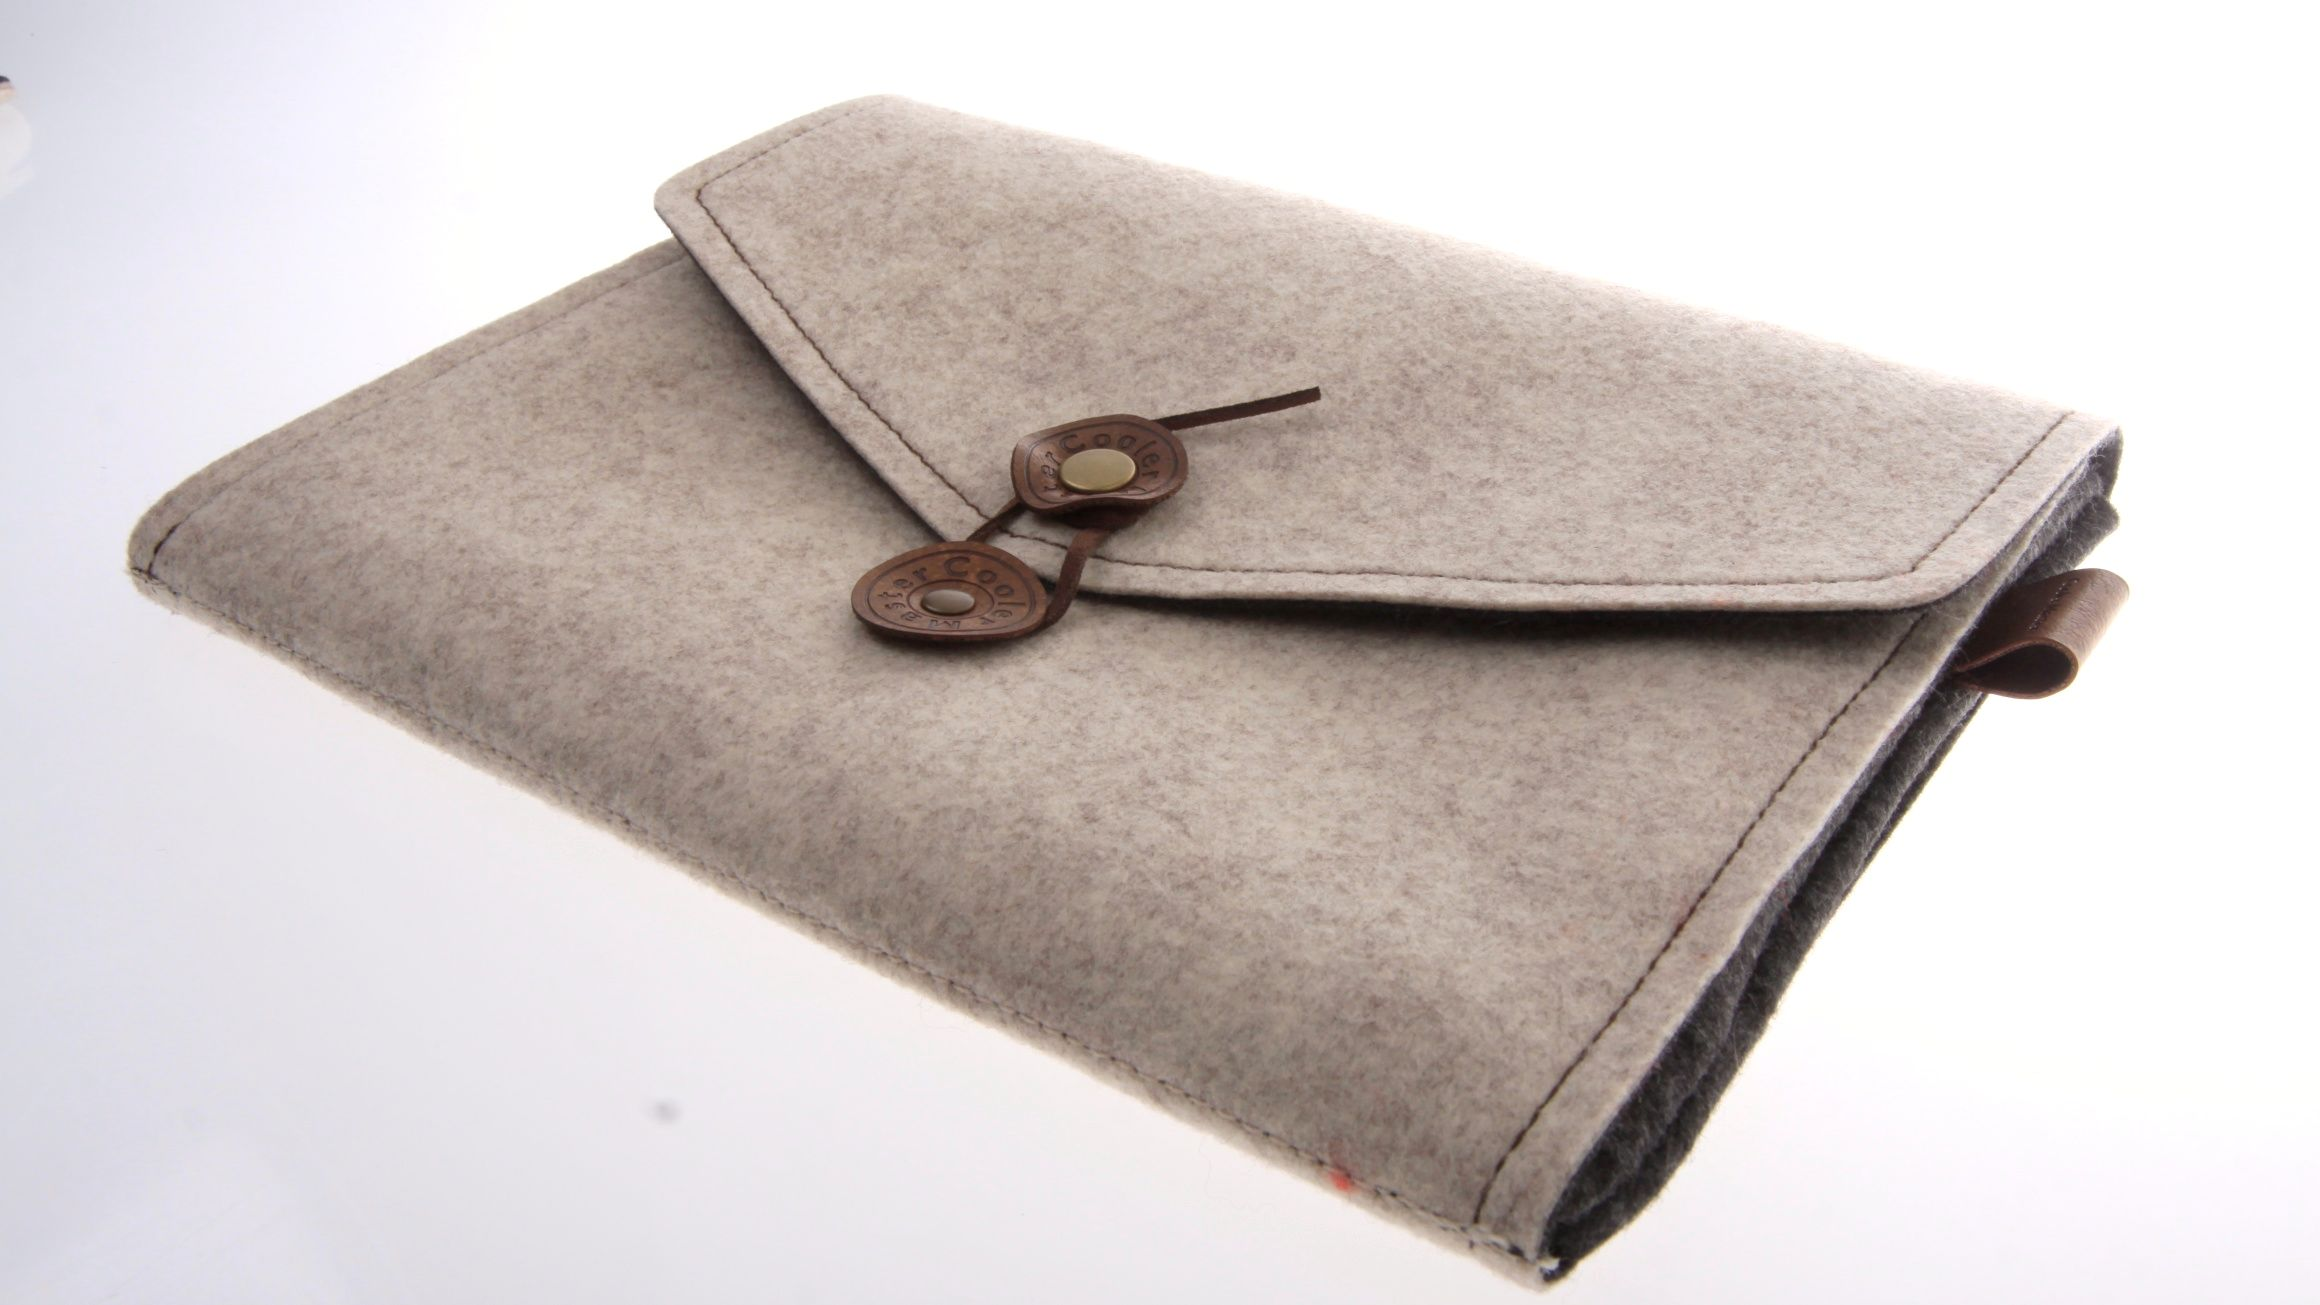 Coolermaster Cormo Sleeve beskytter iPad-en.Foto: Kurt Lekanger, Amobil.no